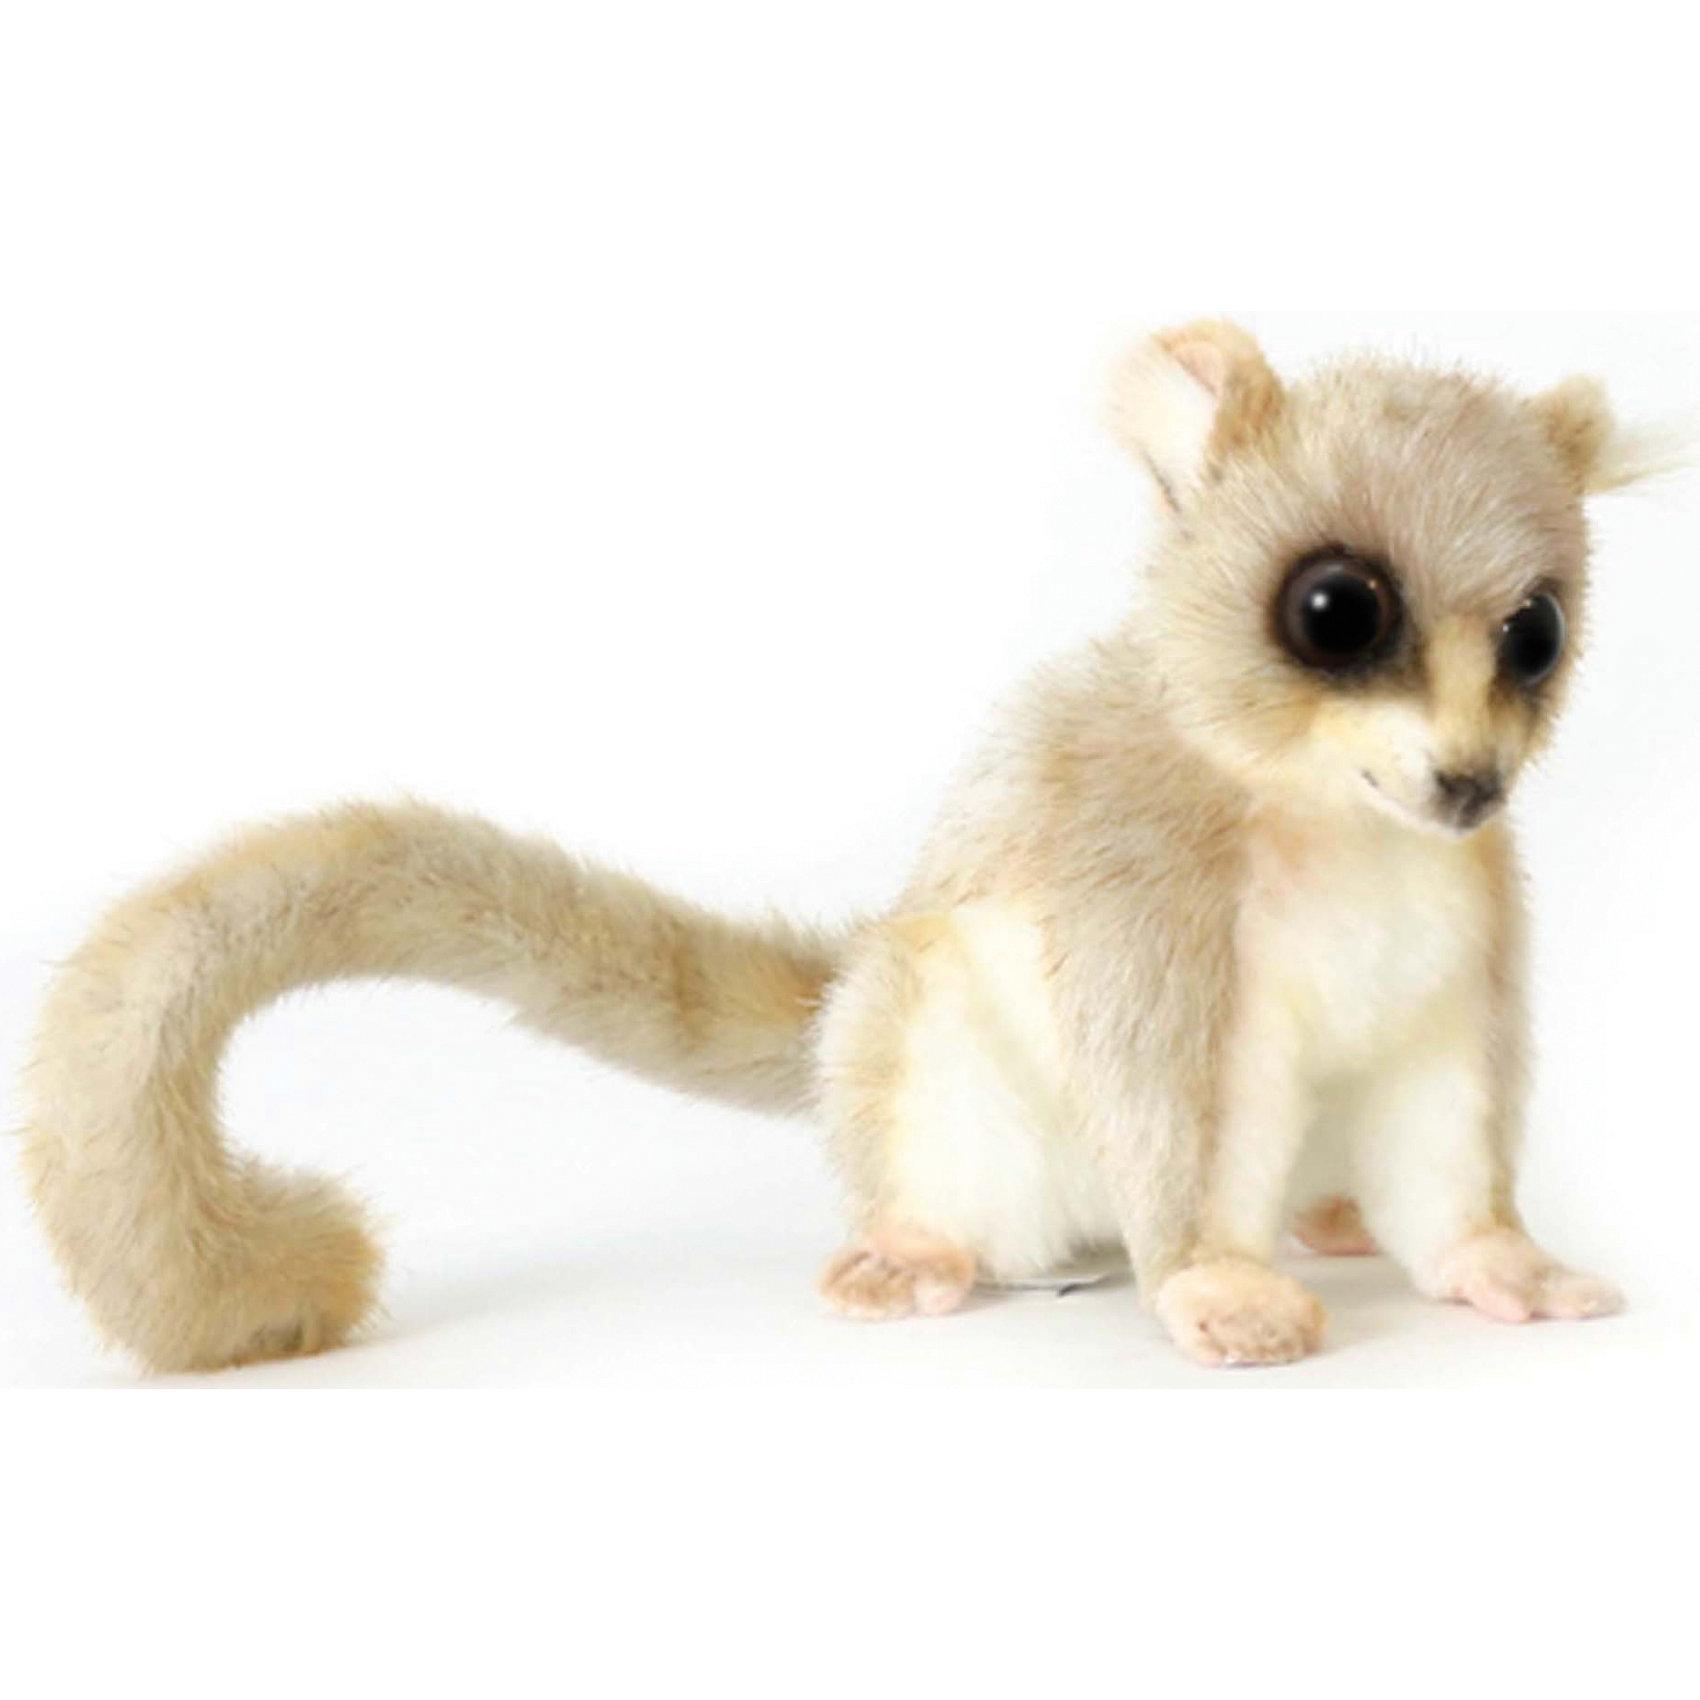 Hansa Мышиный лемур, 14 см мягкие игрушки hansa мышиный лемур 14 см